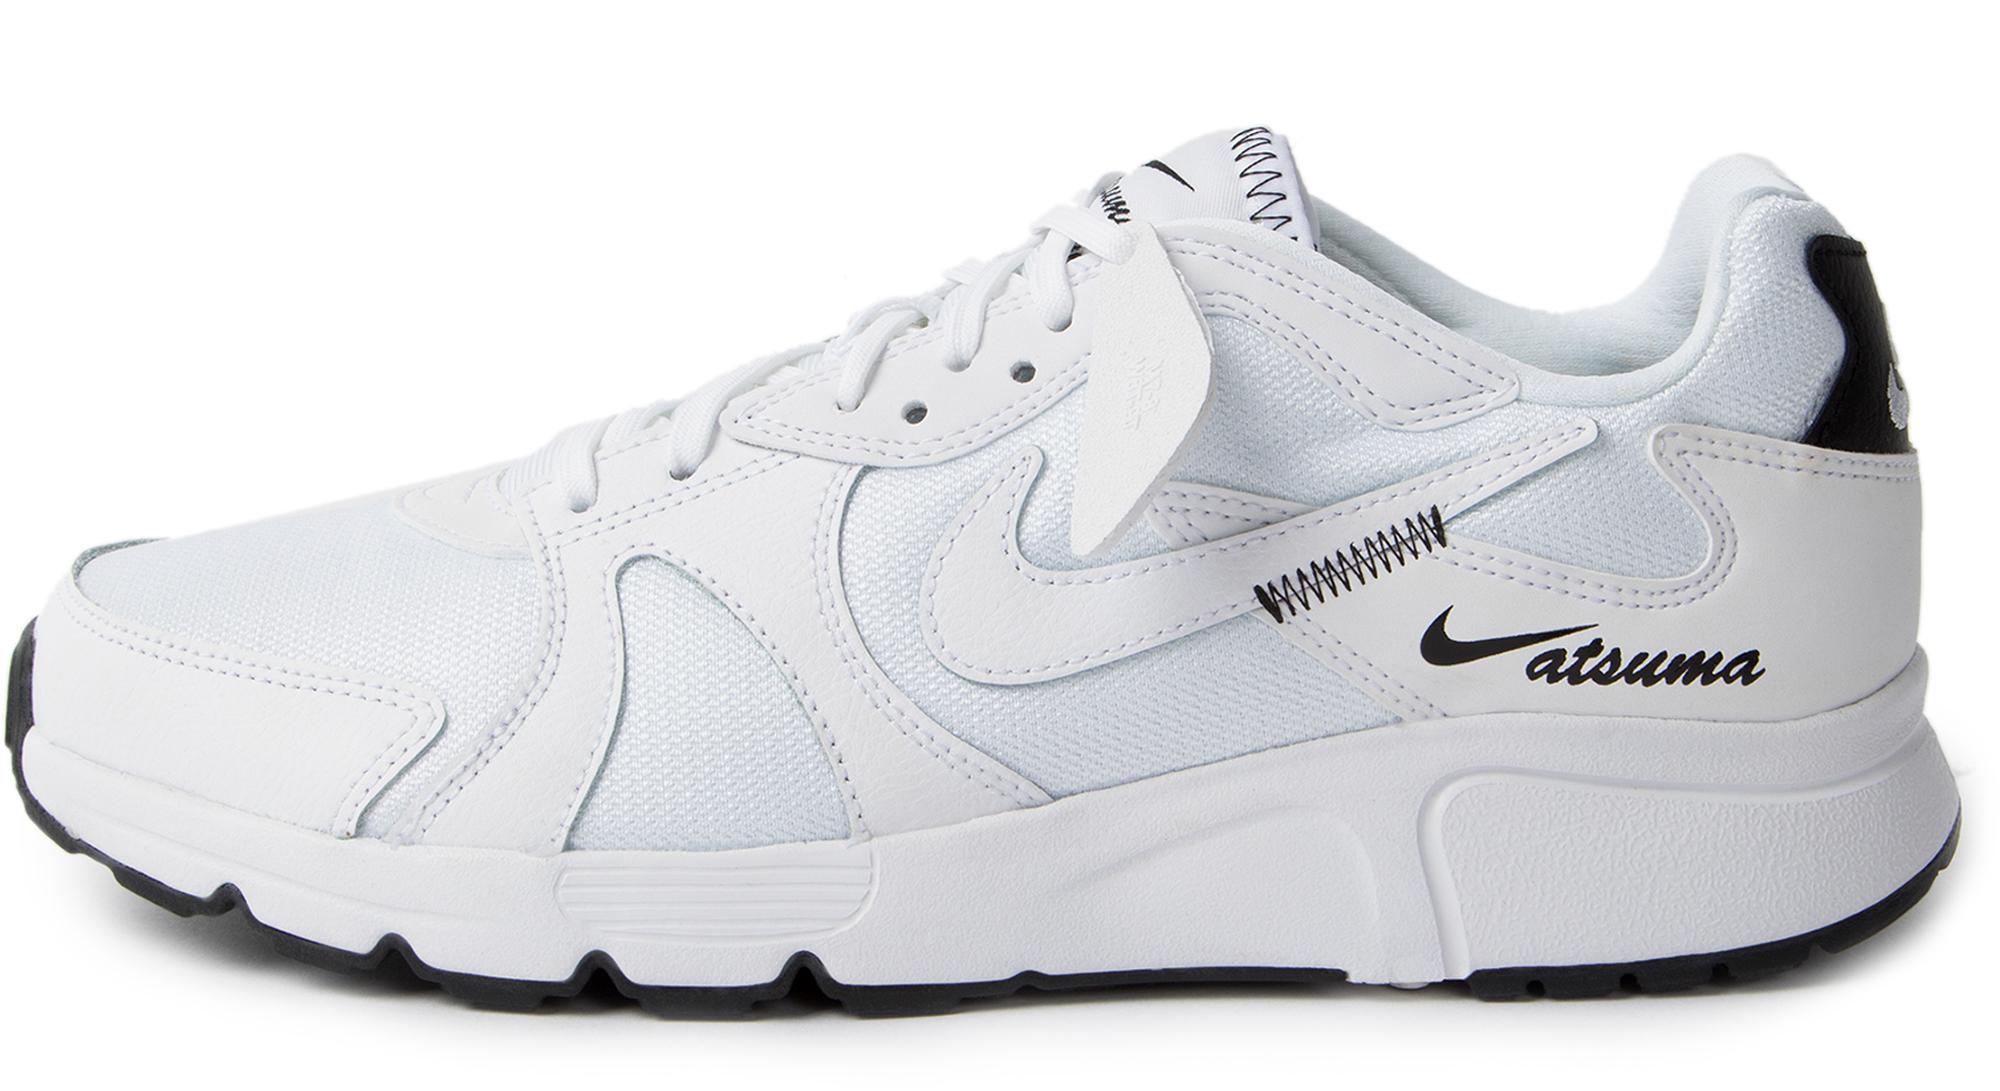 Nike Кроссовки женские Nike Atsuma, размер 35